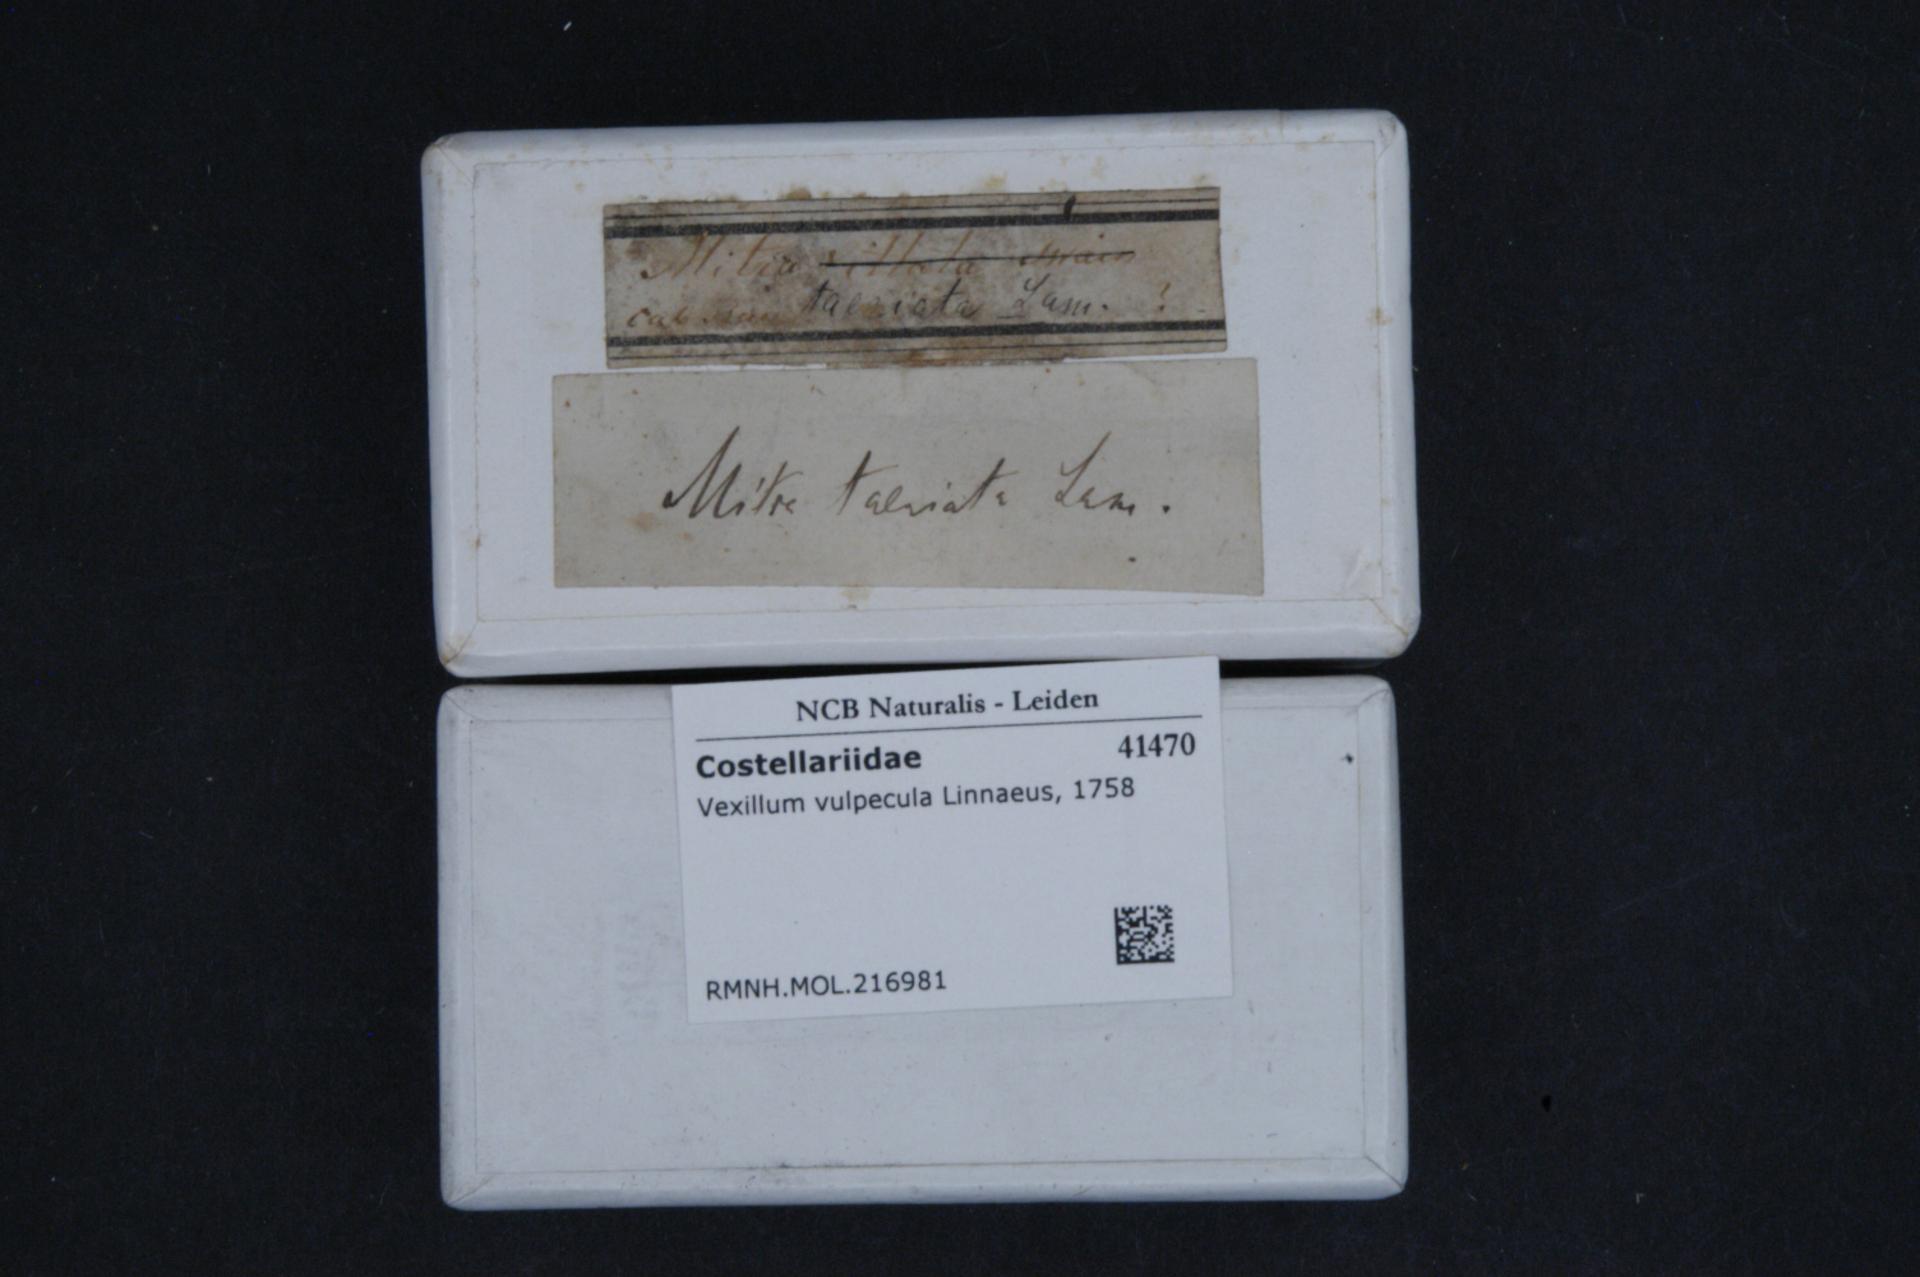 RMNH.MOL.216981 | Vexillum vulpecula (Linnaeus, 1758)